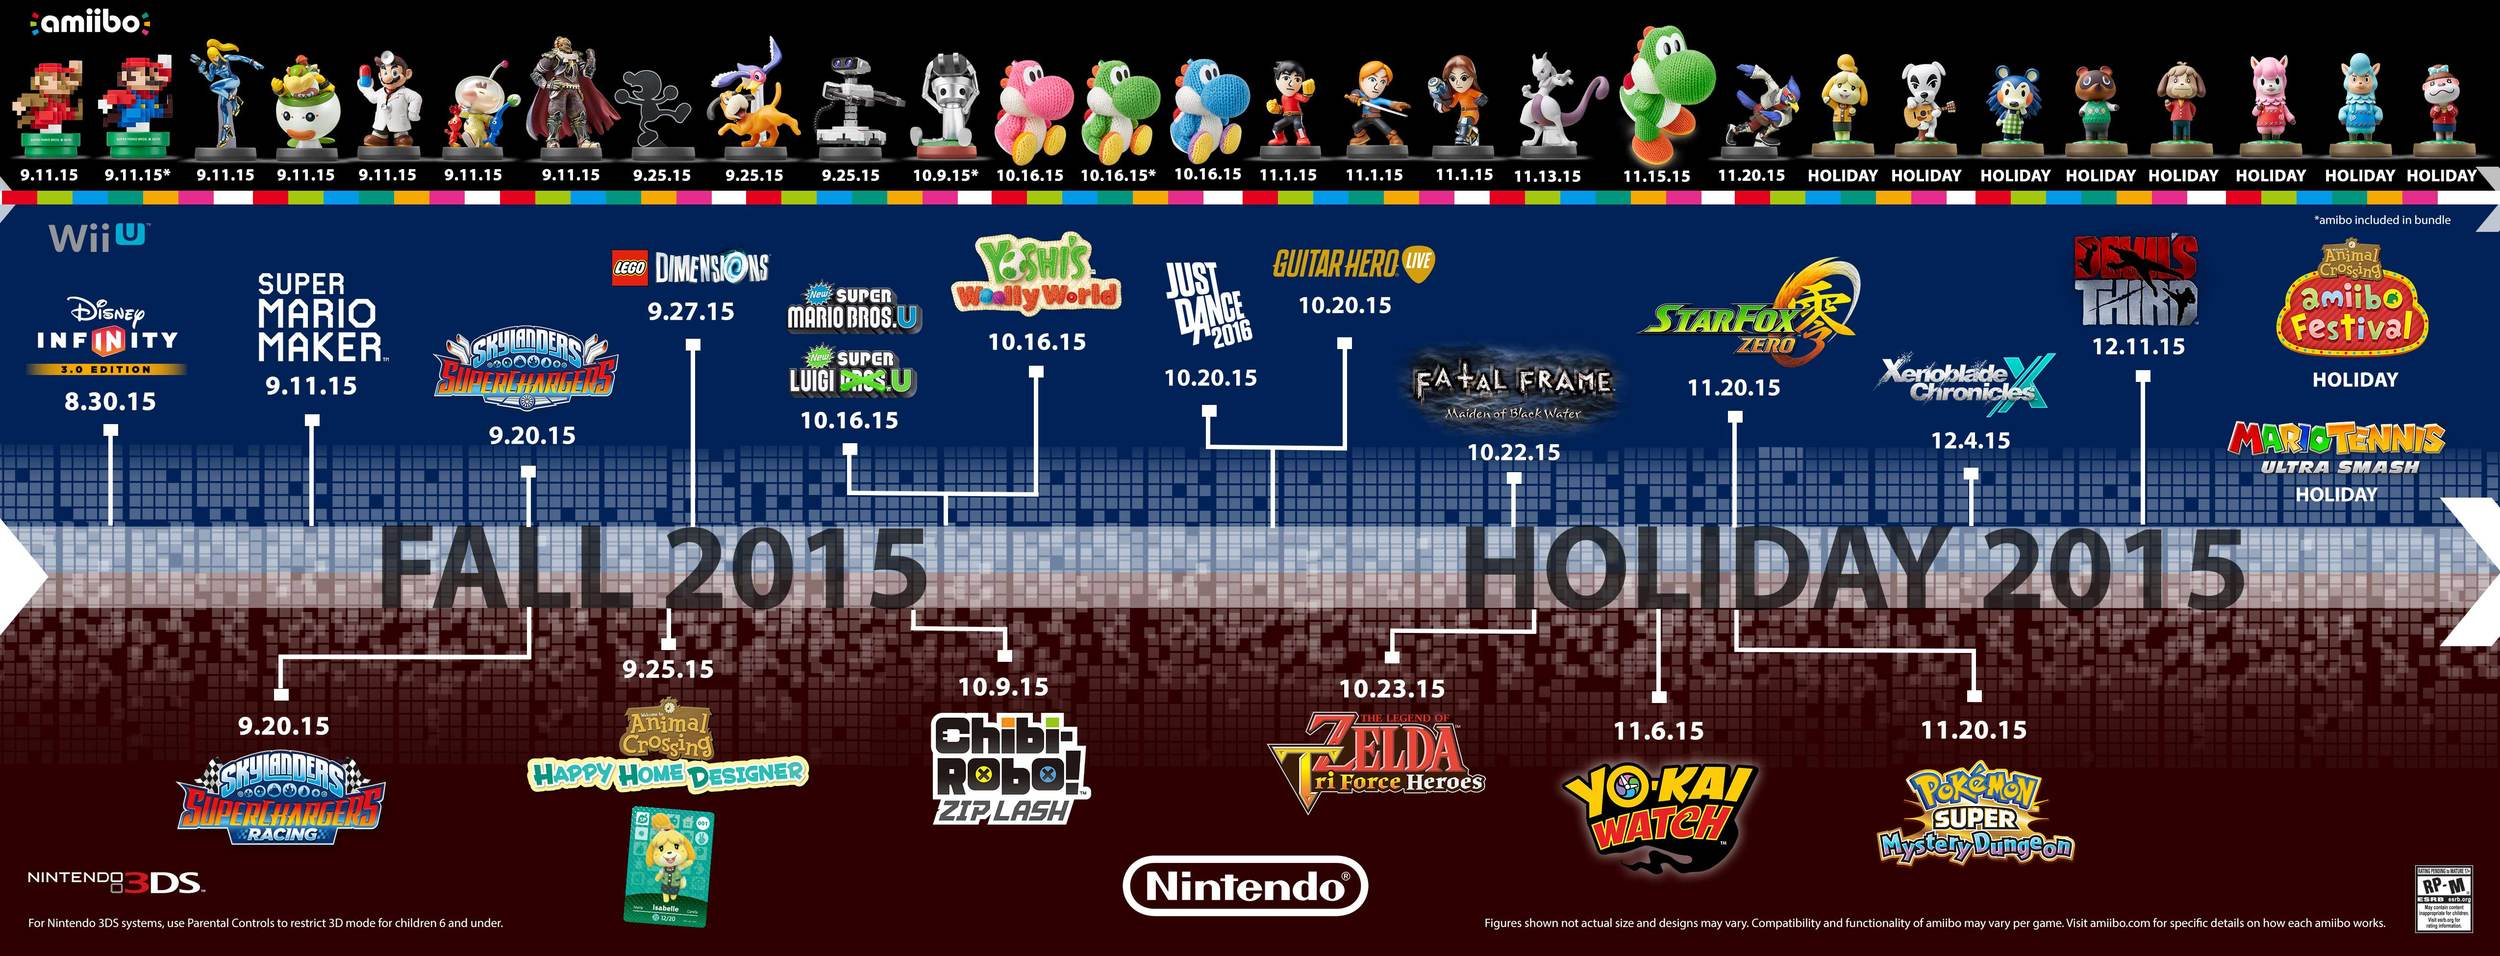 Nintendo's product roadmap through 2015.